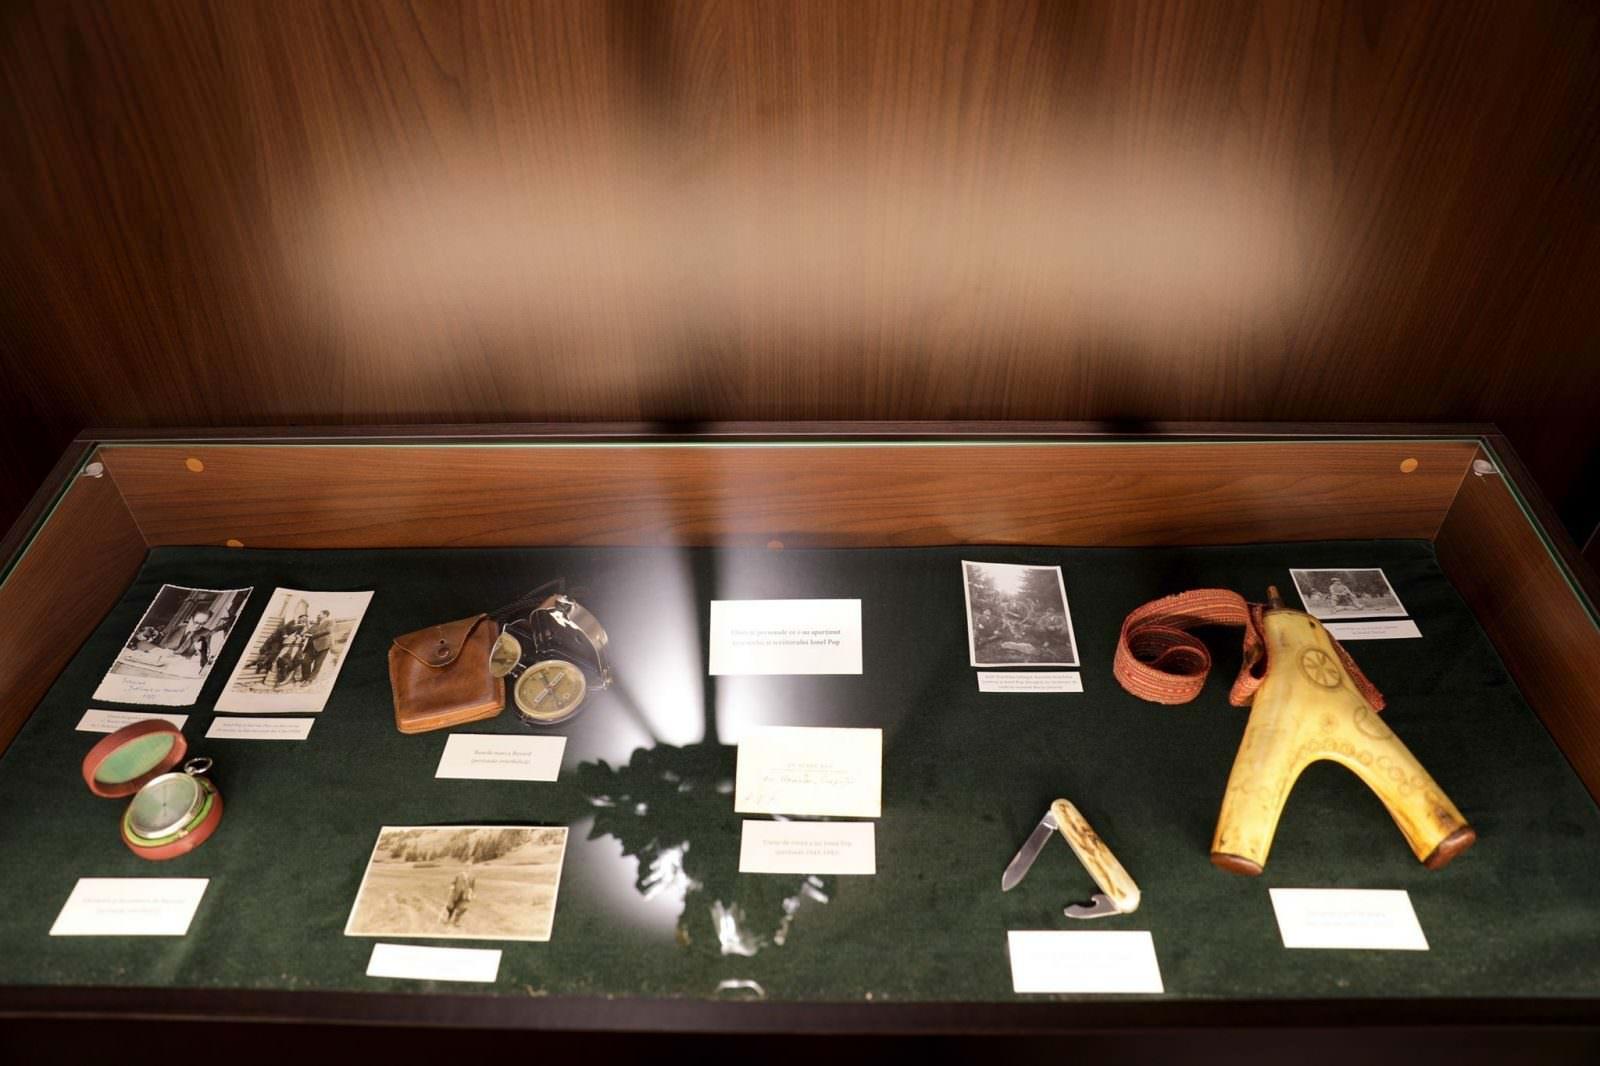 muzeul cinegetic expozitie 6